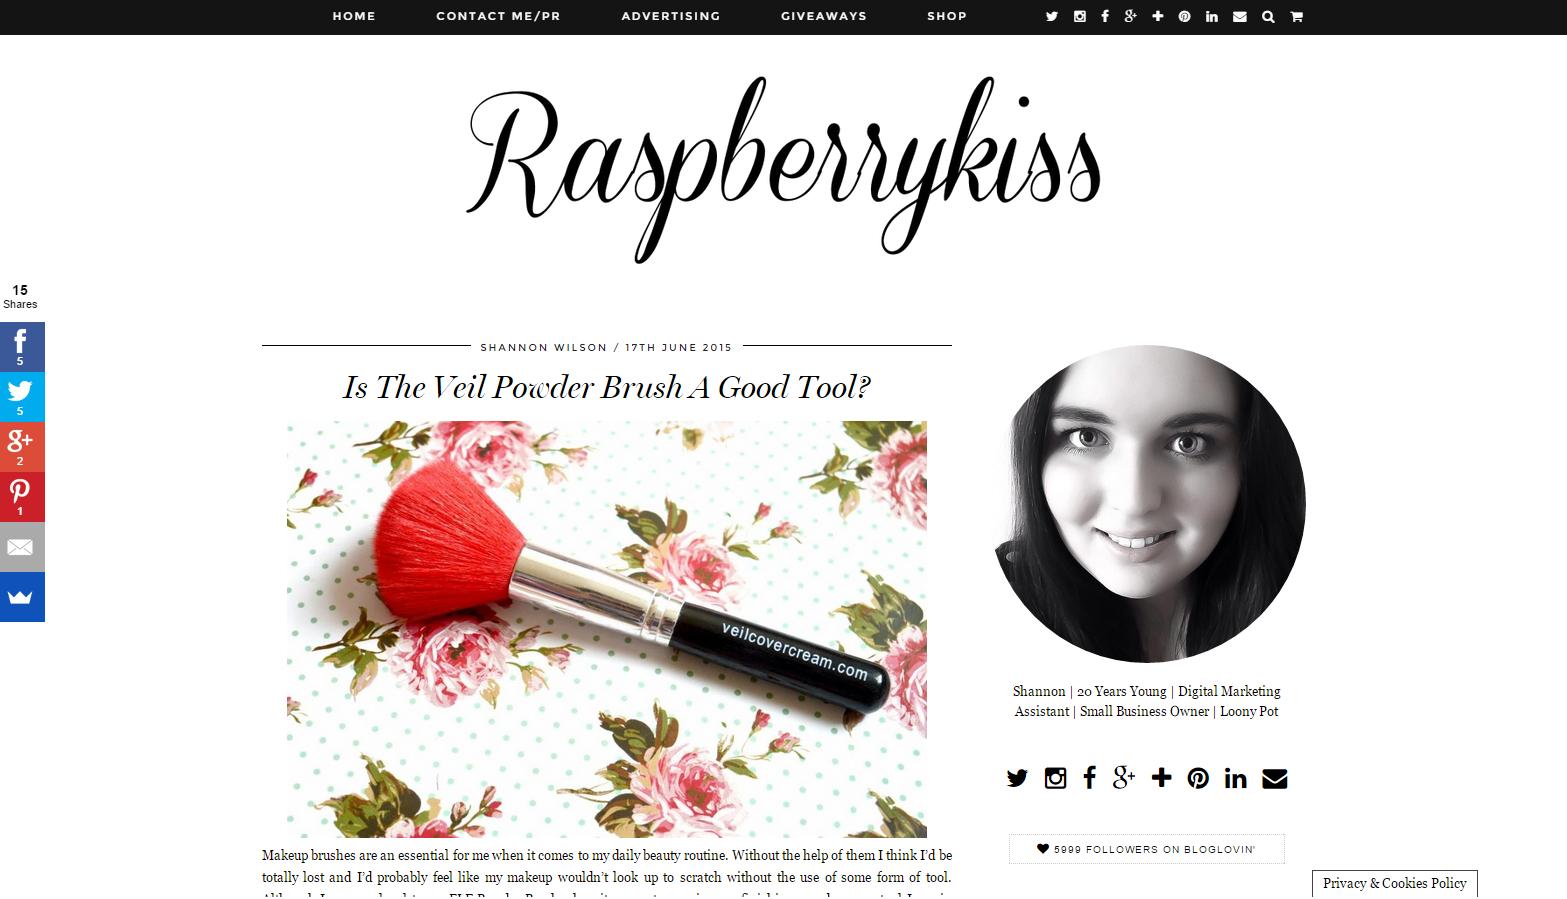 Veil Powder Brush Featured On Raspberrykiss